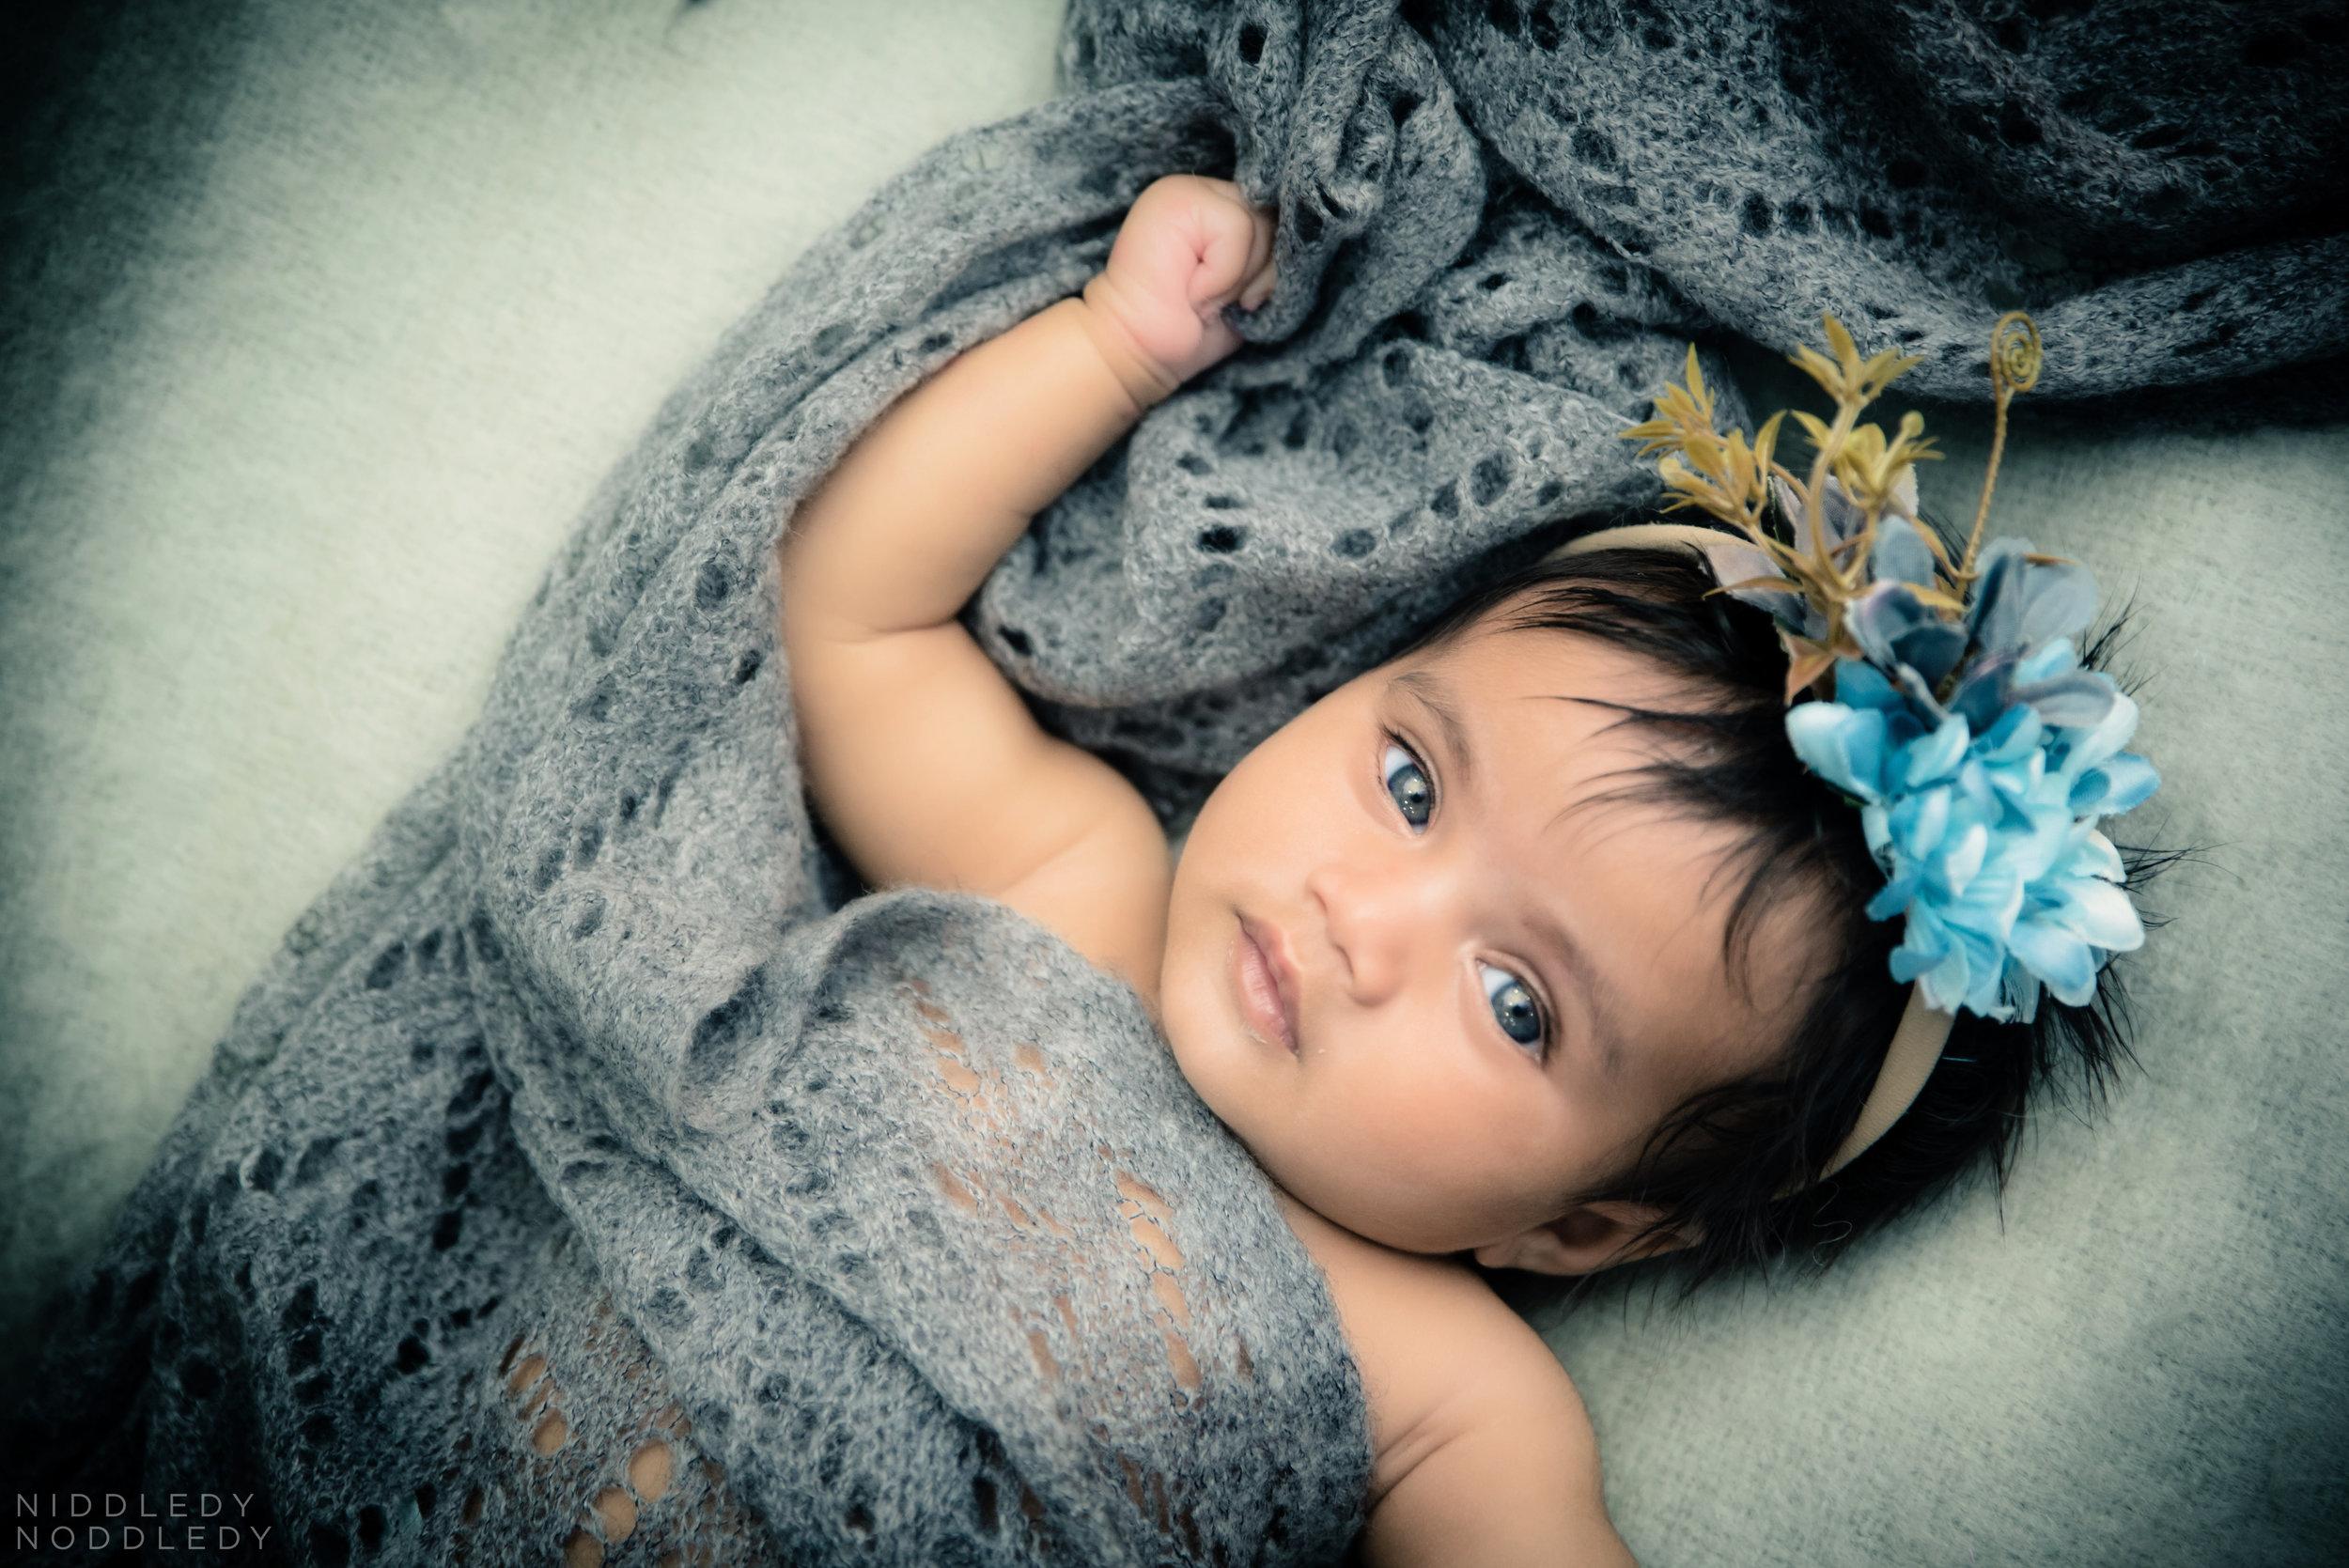 Rishika Newborn Photoshoot ❤ NiddledyNoddledy.com ~ Bumps to Babies Photography, Kolkata - 08.jpg